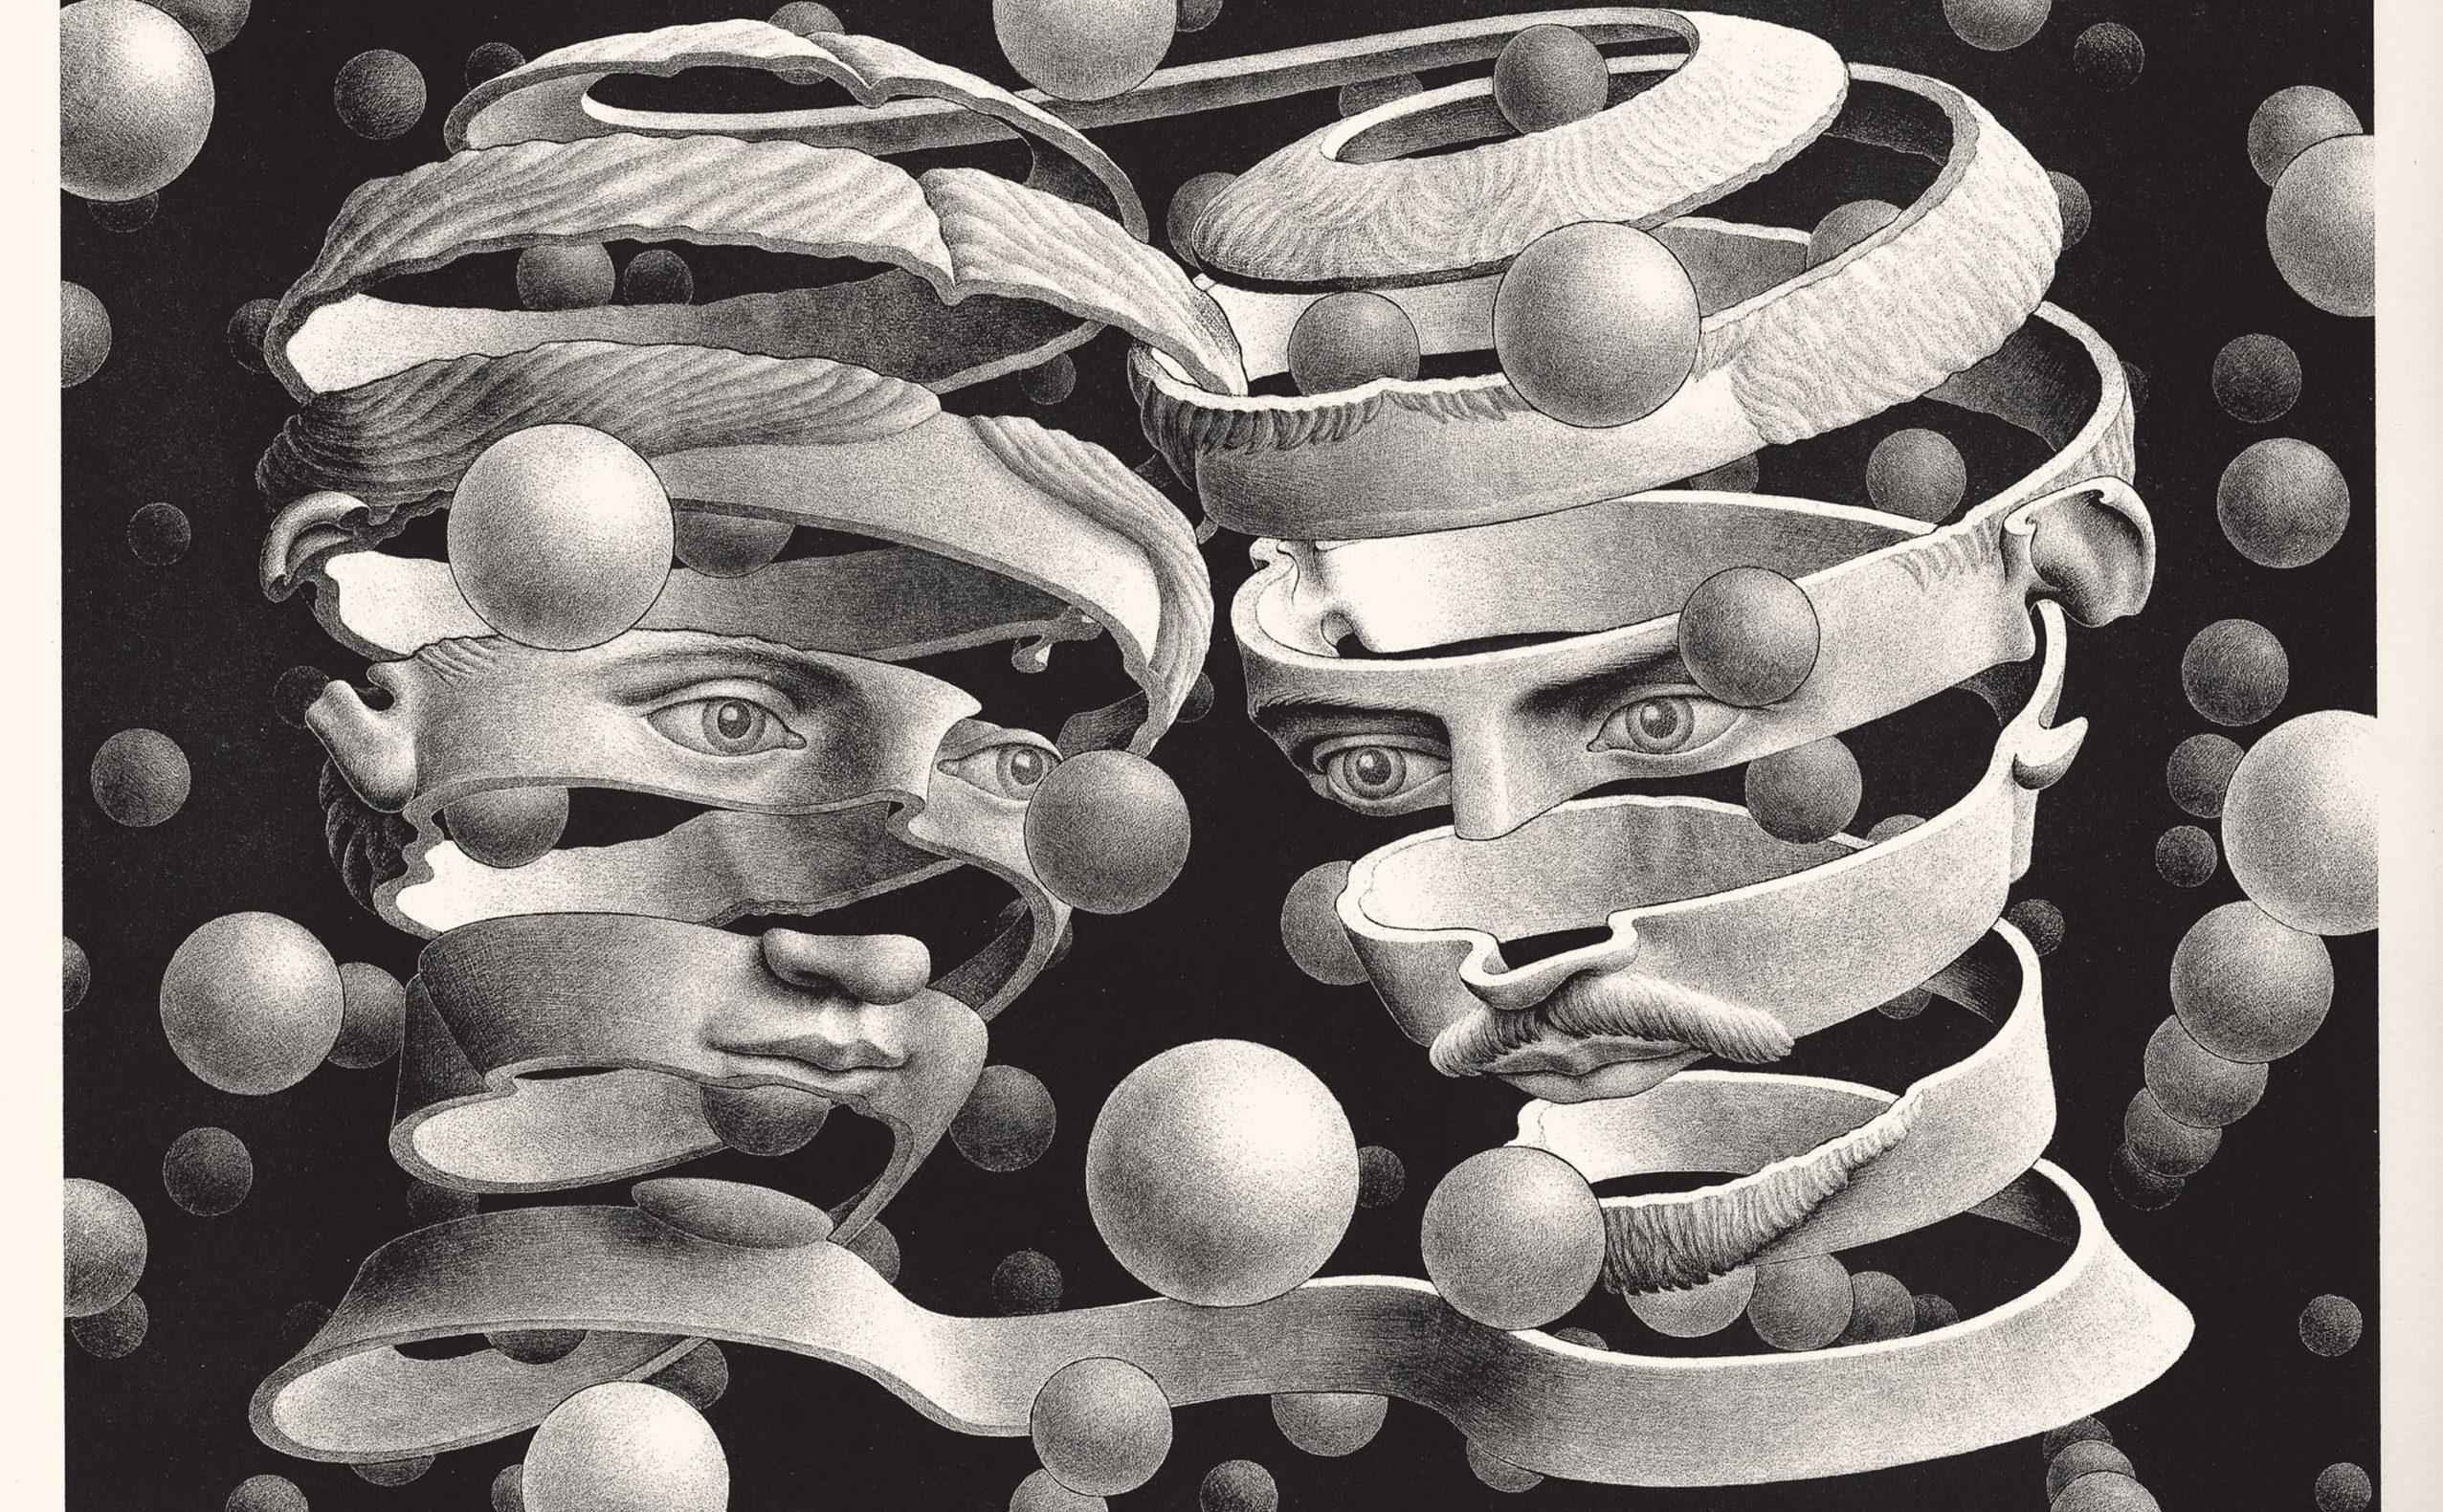 Scale illusorie e prospettive ribaltate. In mostra a Trieste le perturbanti opere di Escher